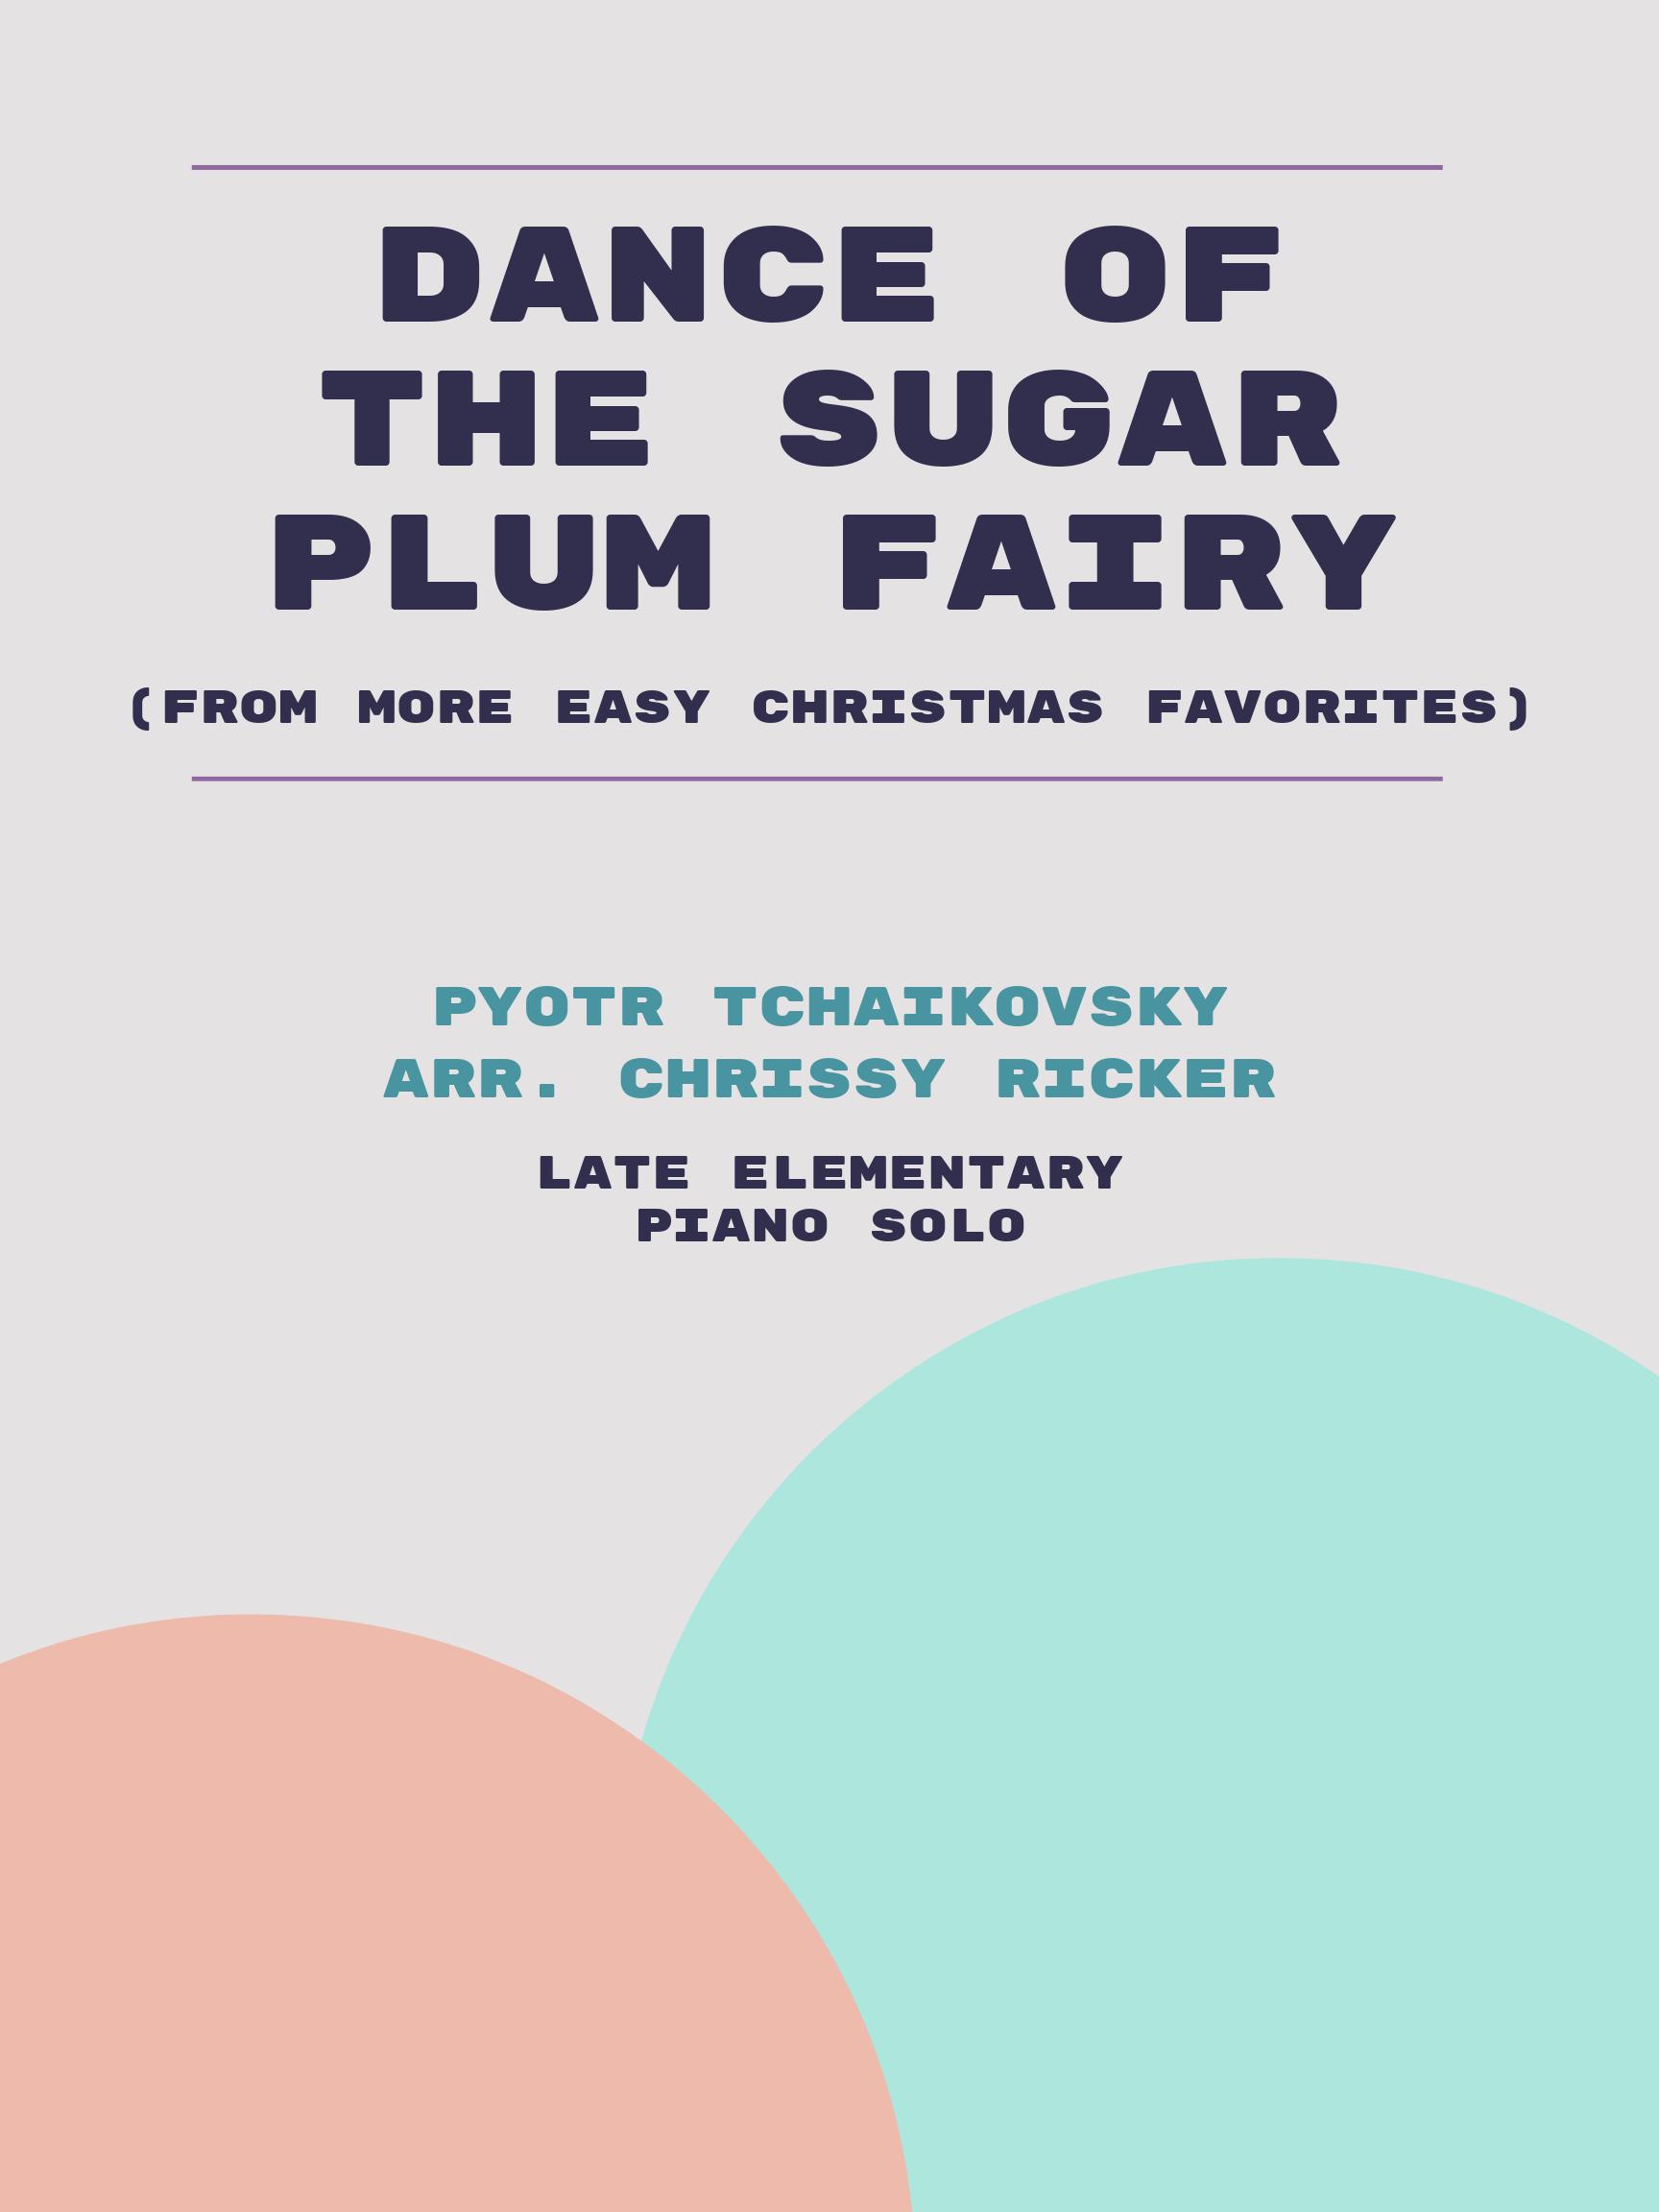 Dance of the Sugar Plum Fairy by Pyotr Tchaikovsky